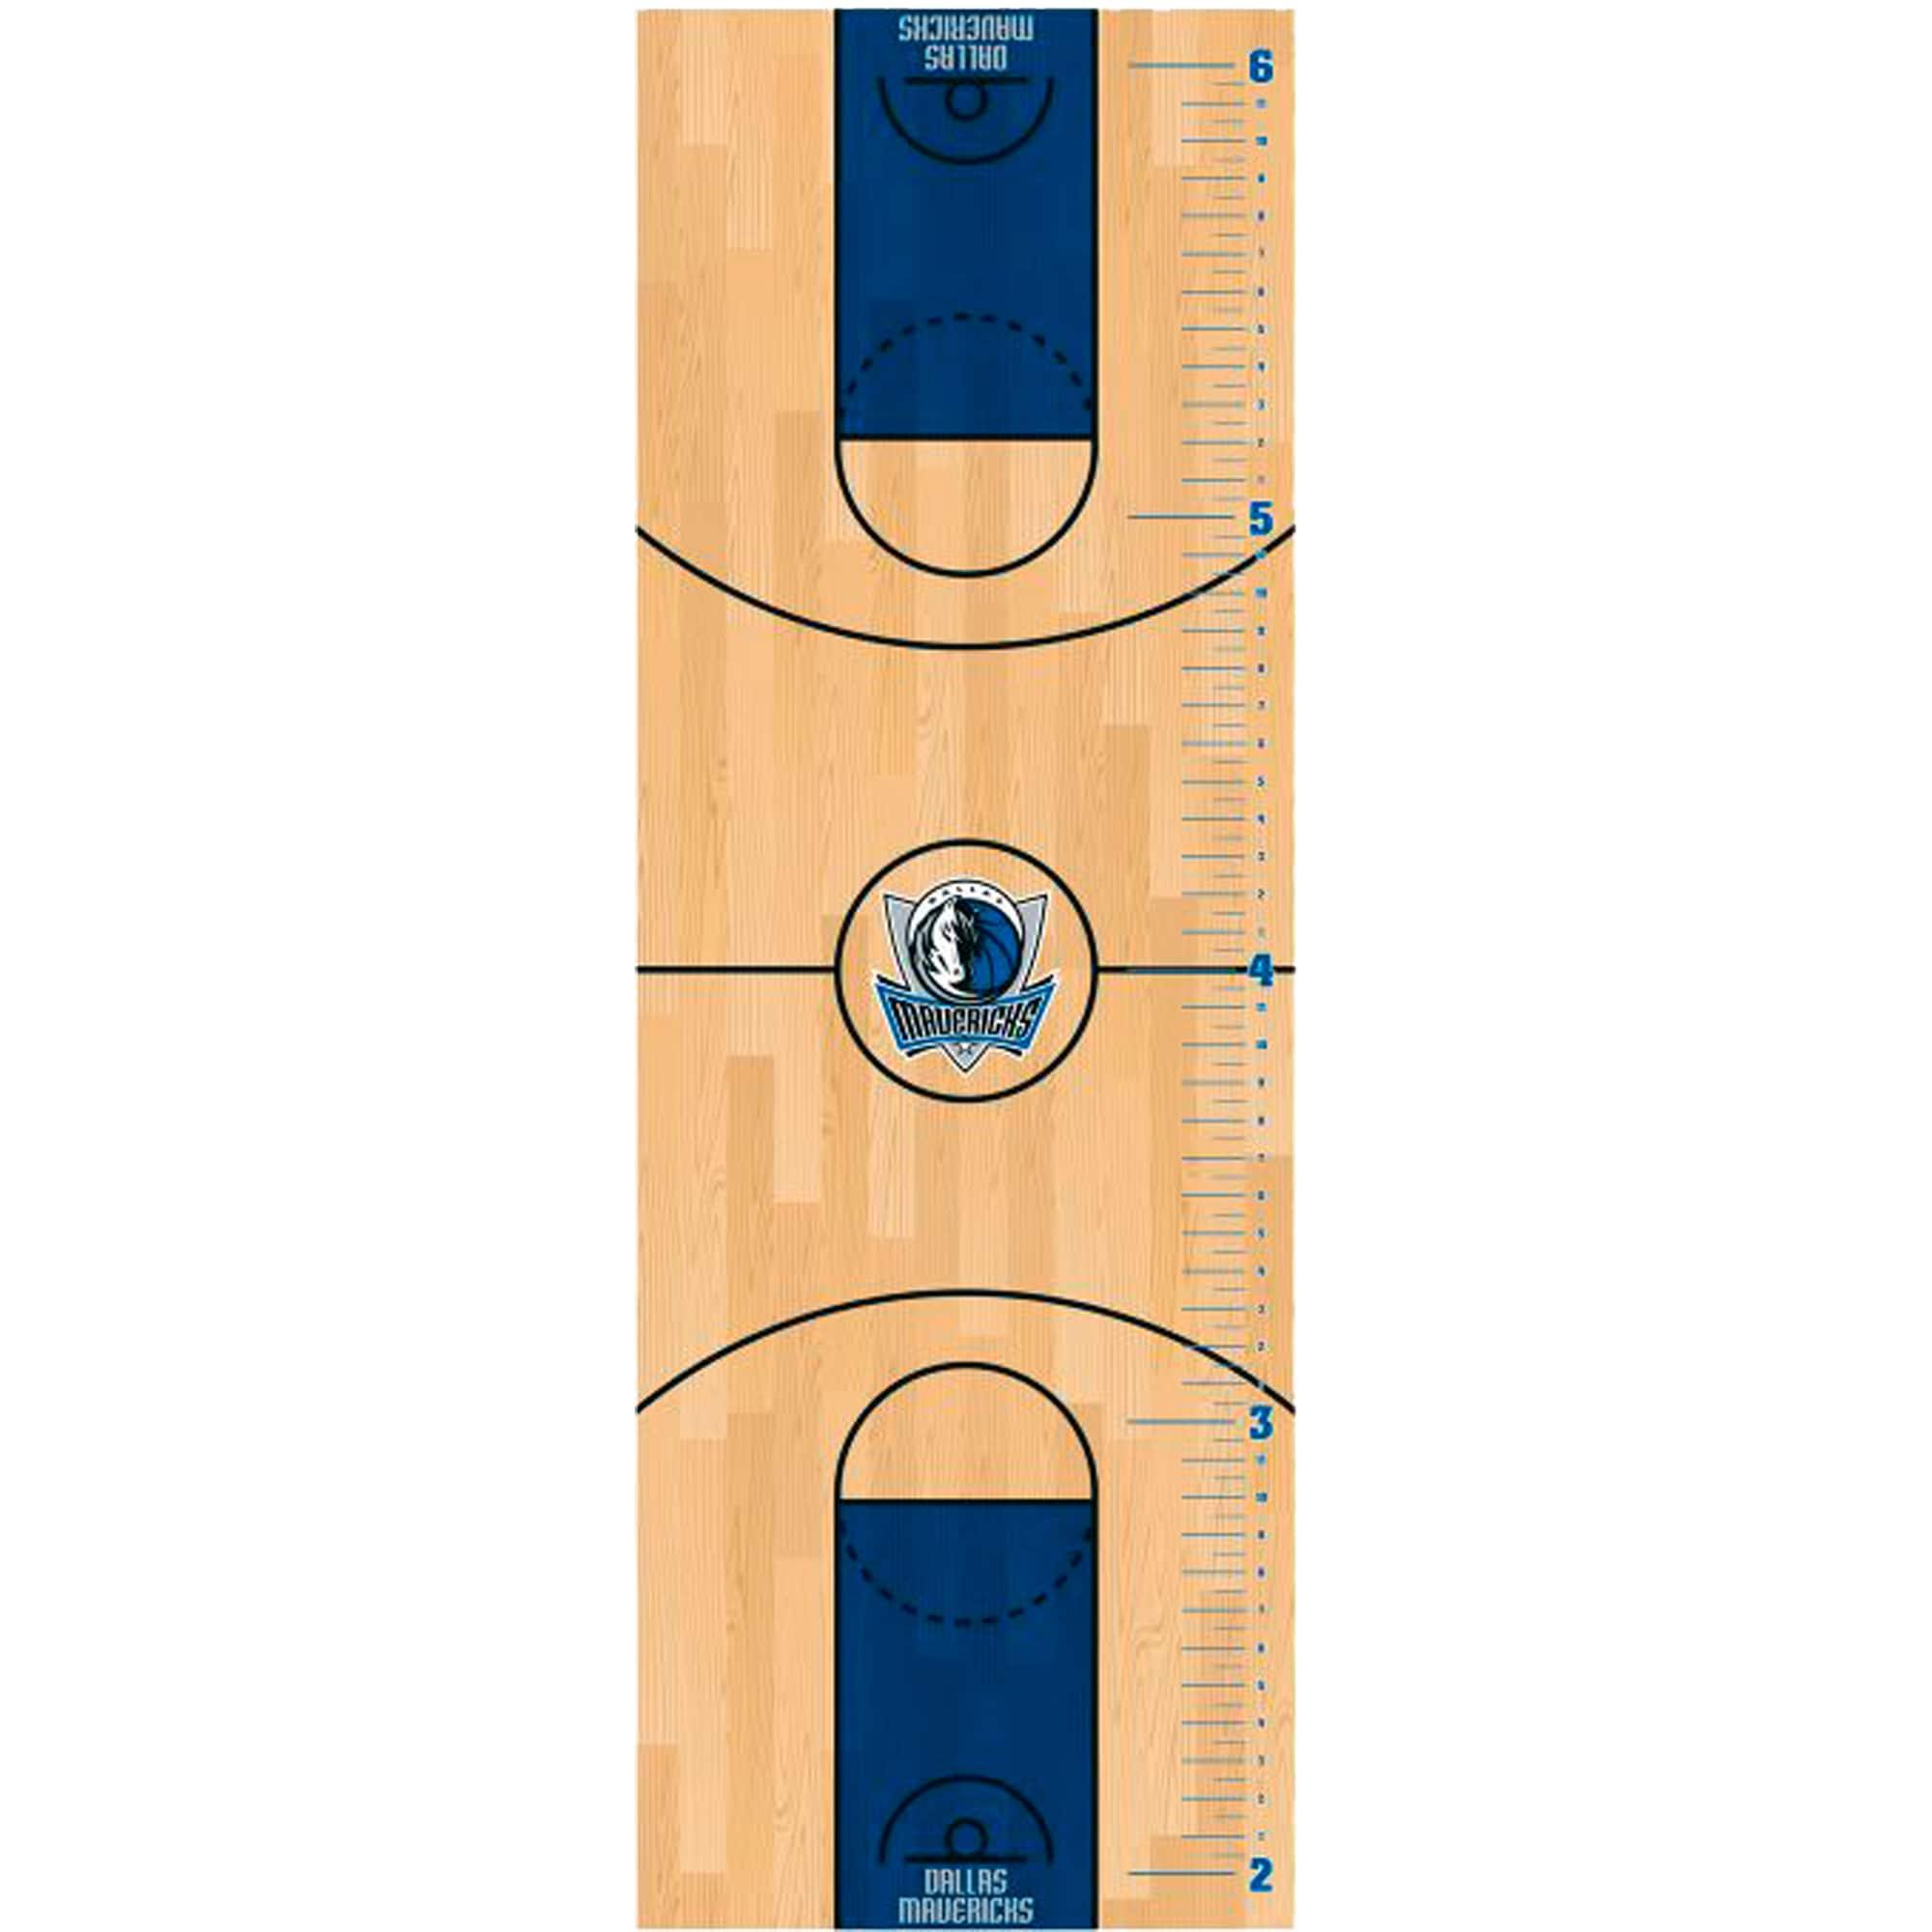 Dallas Mavericks Fathead Basketball Court Large Removable Growth Chart